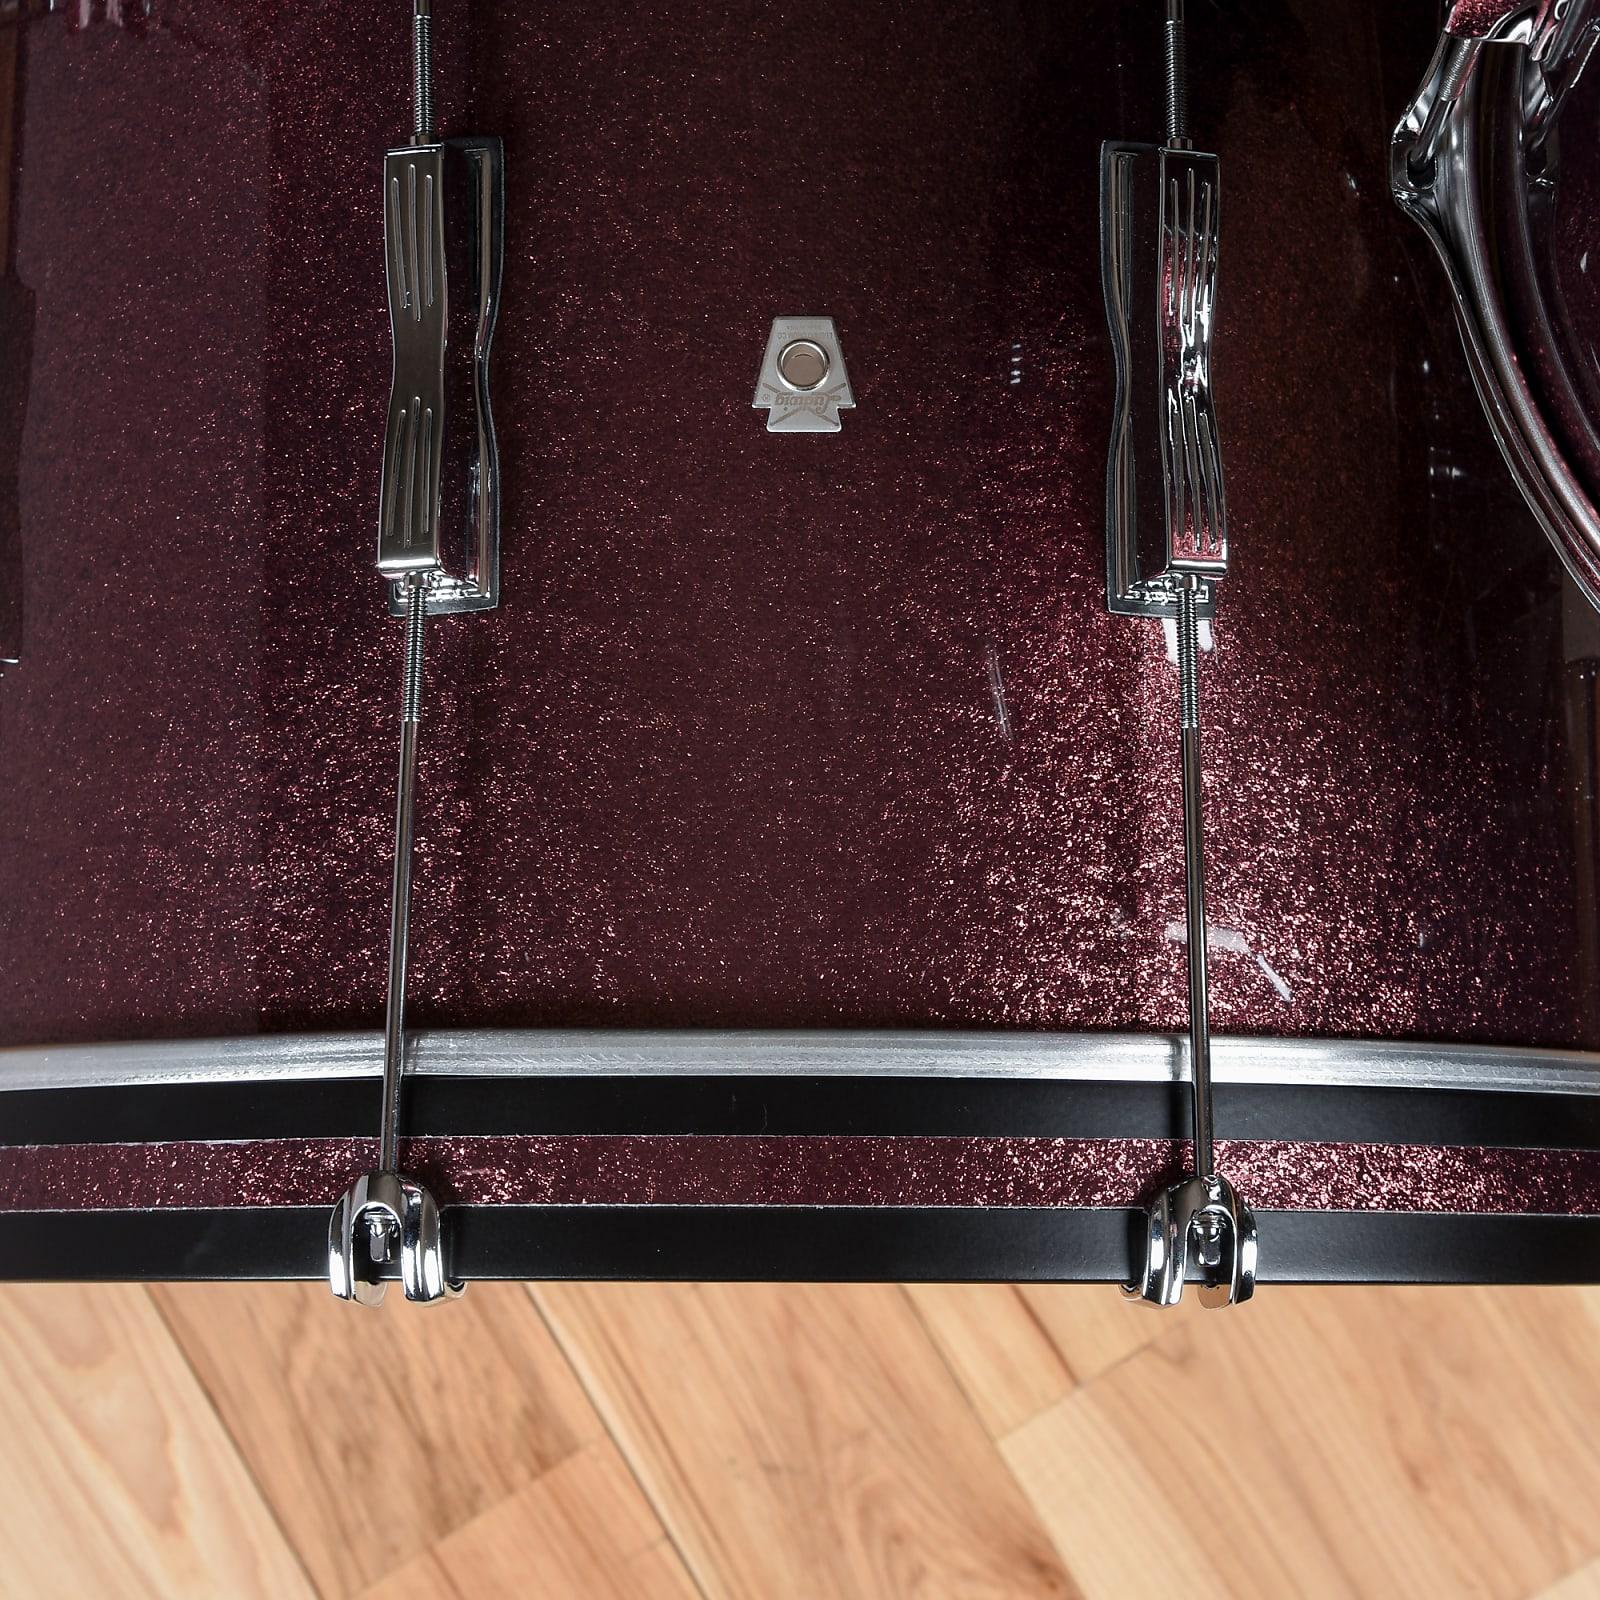 Ludwig Club Date 13/16/22 3pc. Drum Kit Burgundy Mist w/Bowtie Lugs & White Interior (CDE Exclusive)